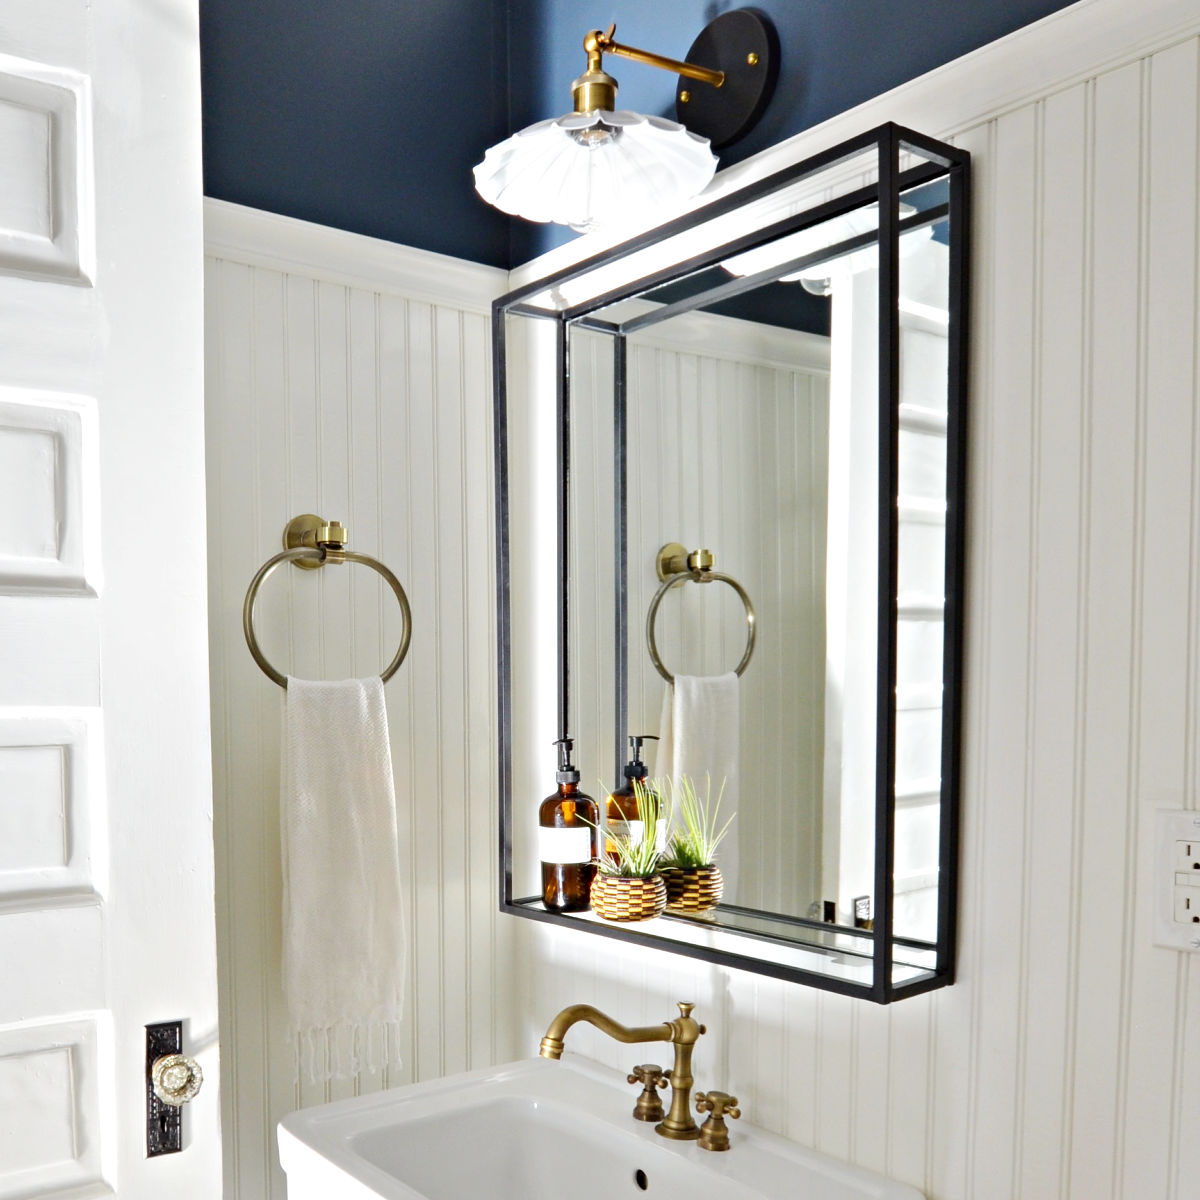 Modern Industrial Black Steel Metal Framed Bathroom Mirror With A Shelf Custom Handmade To Order Simplicity In The South